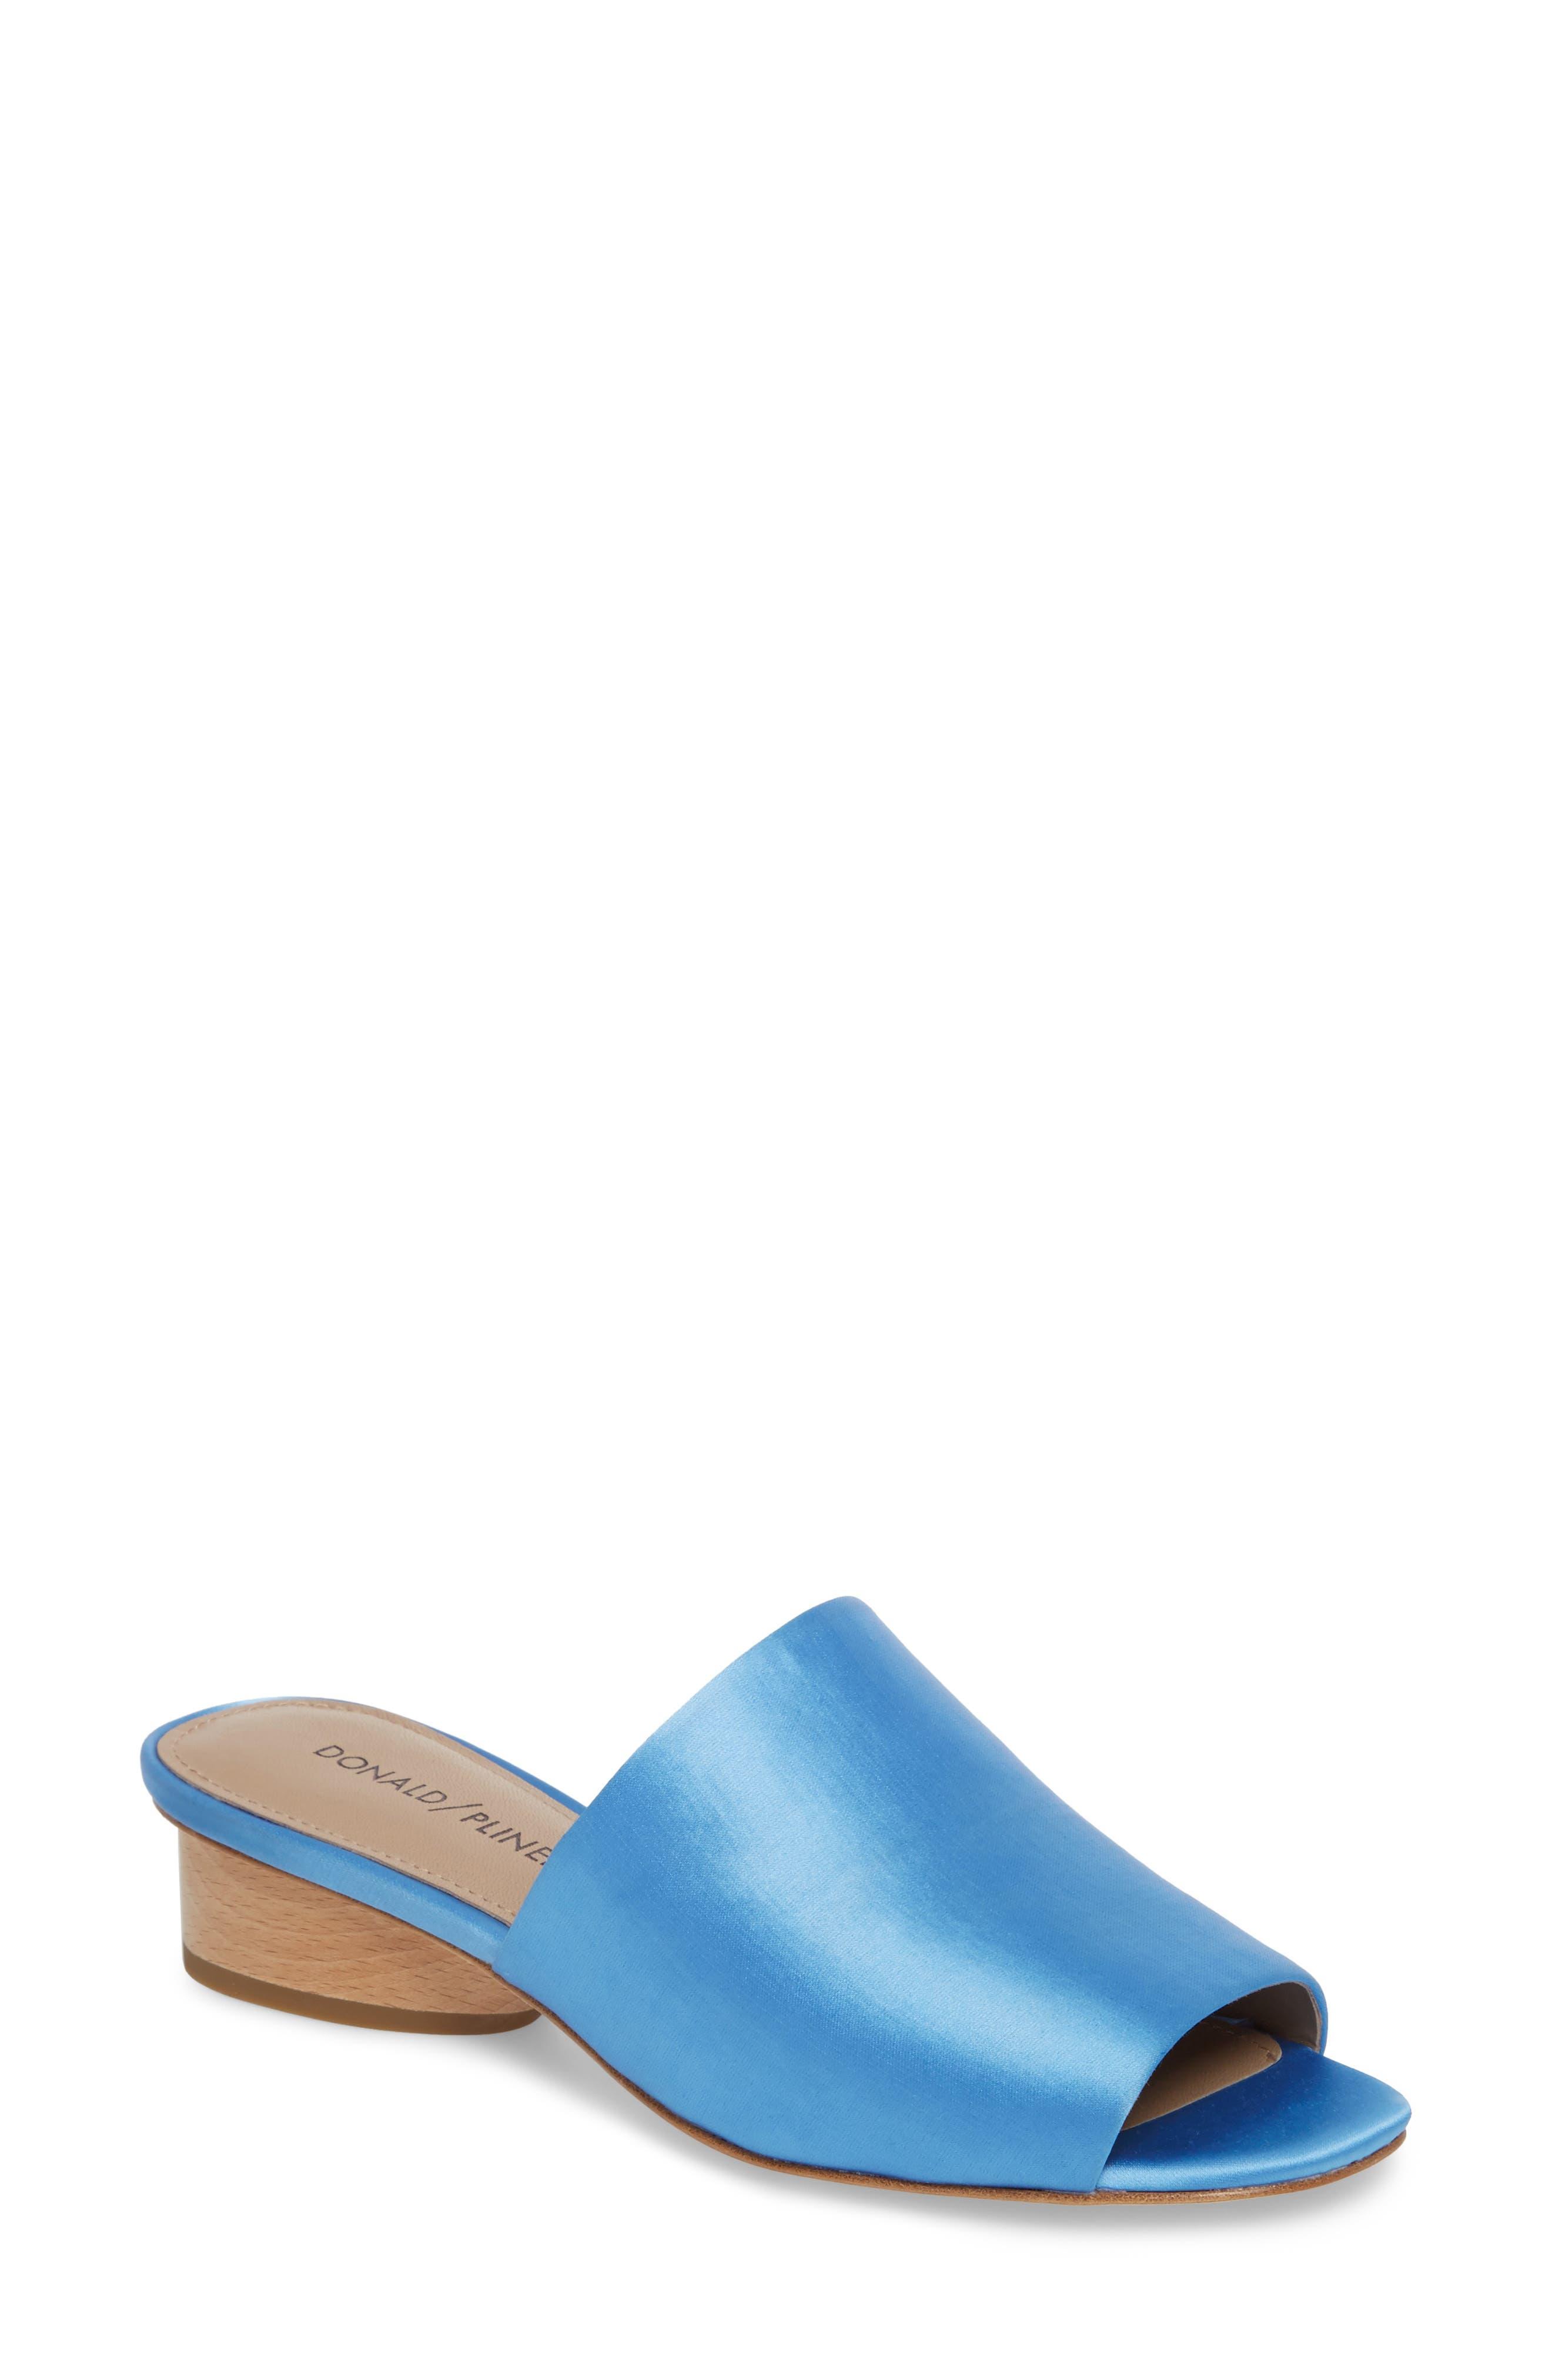 Image of Donald Pliner Rimini Sandal